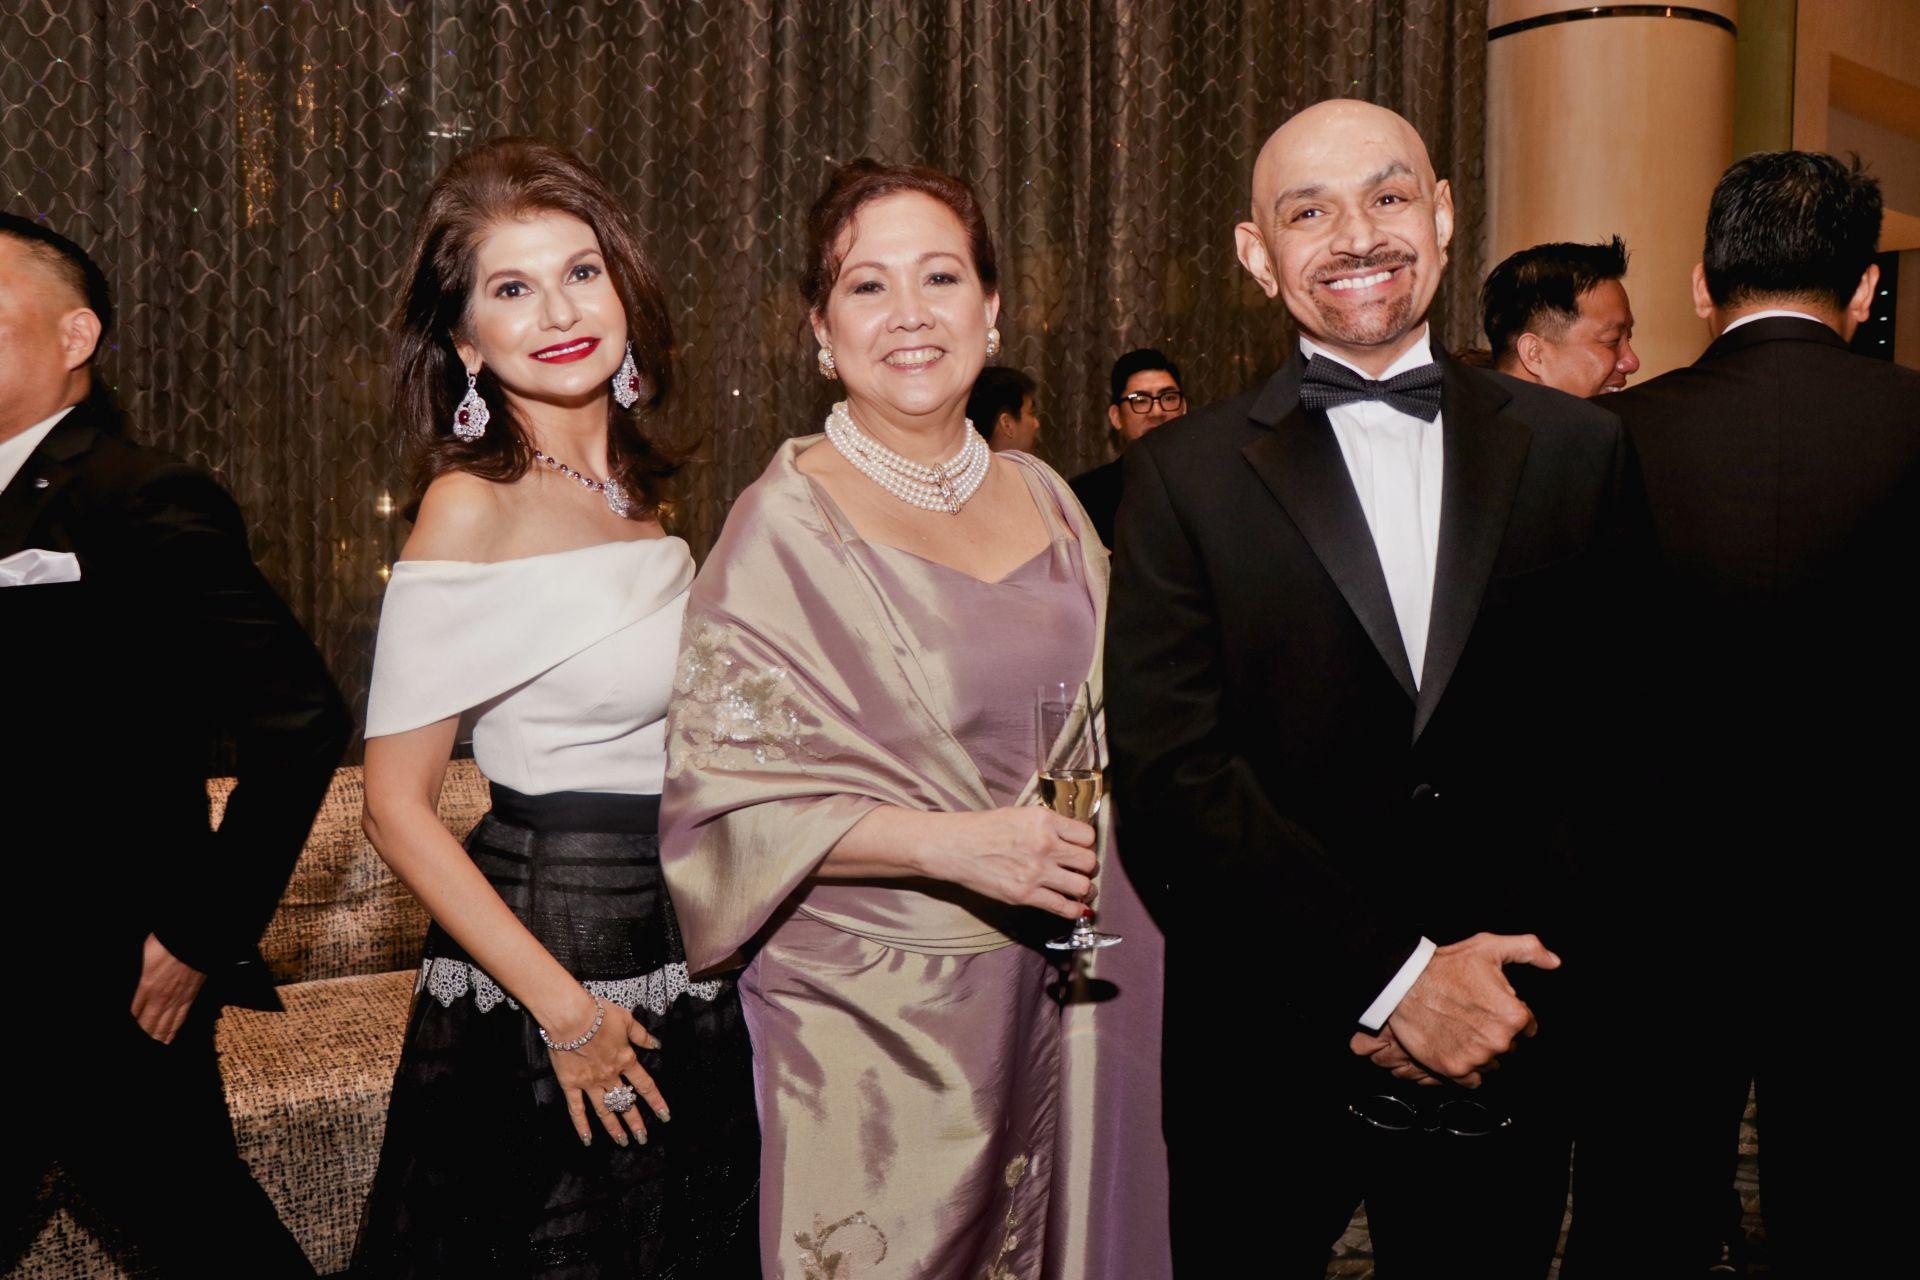 Shirley Daryanani, Carla Ramsey and Ravi Daryanani